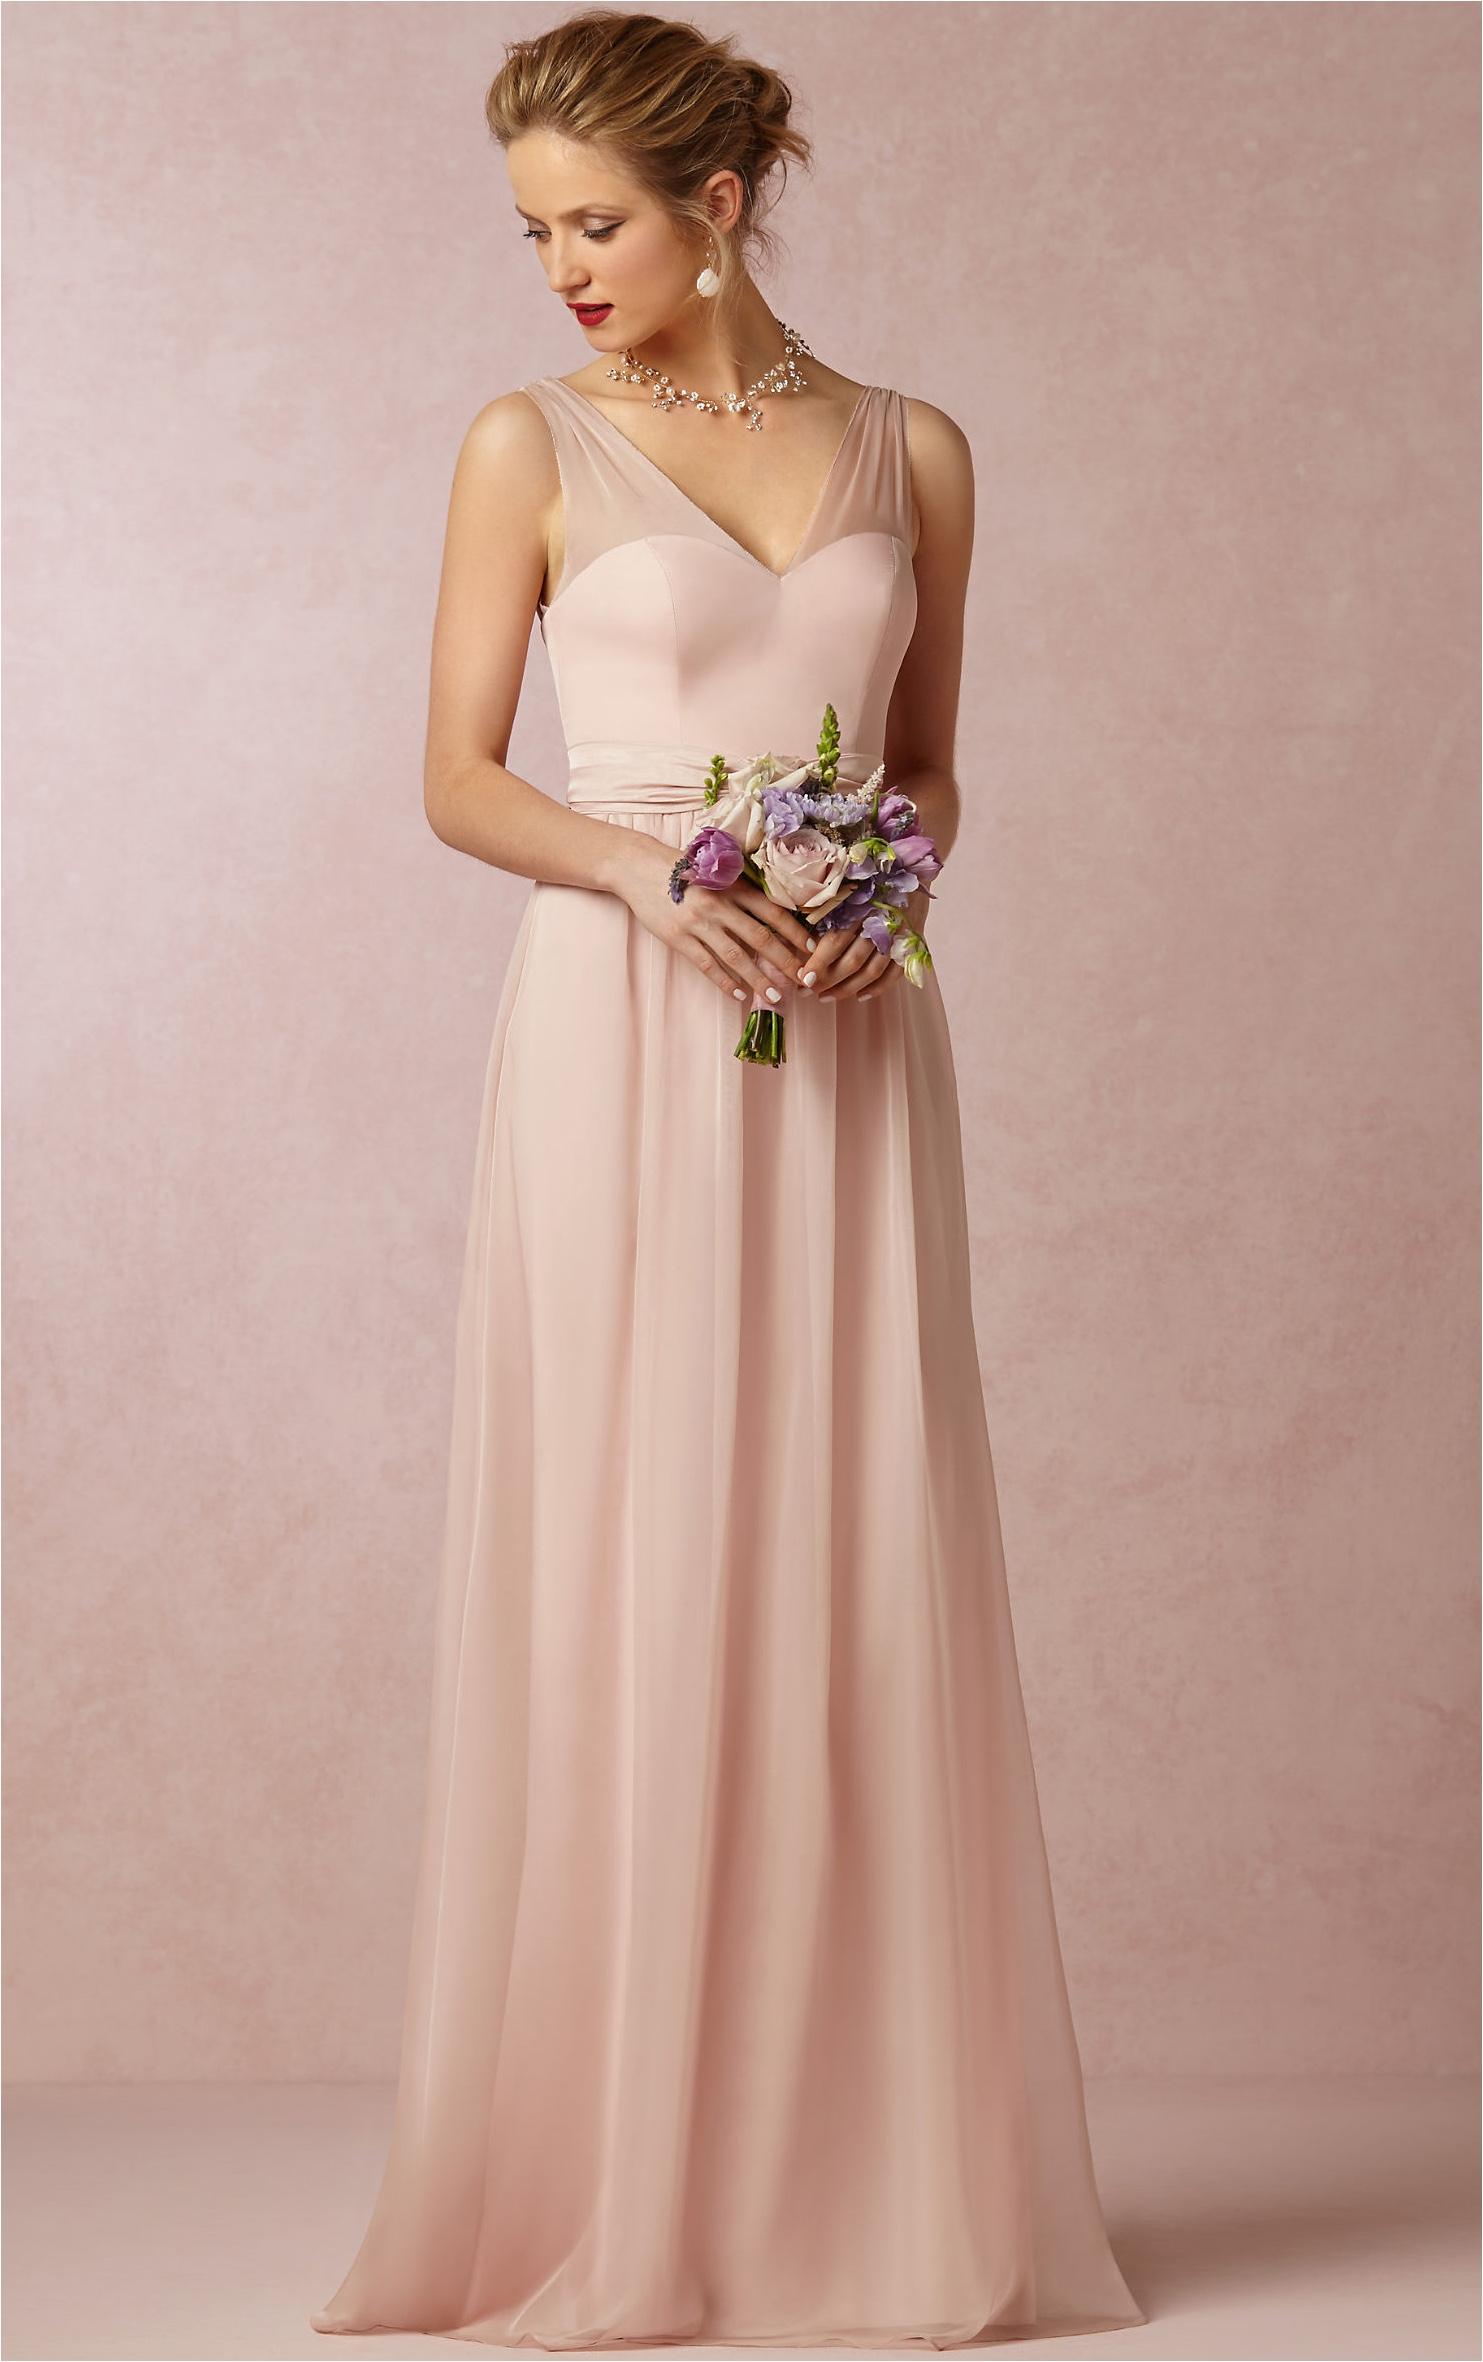 Cap Sleeve Bridesmaid Dresses Floor-length Uk Contemporary Bridesmaids Dresses Usa Photos Wedding Dress Ideas